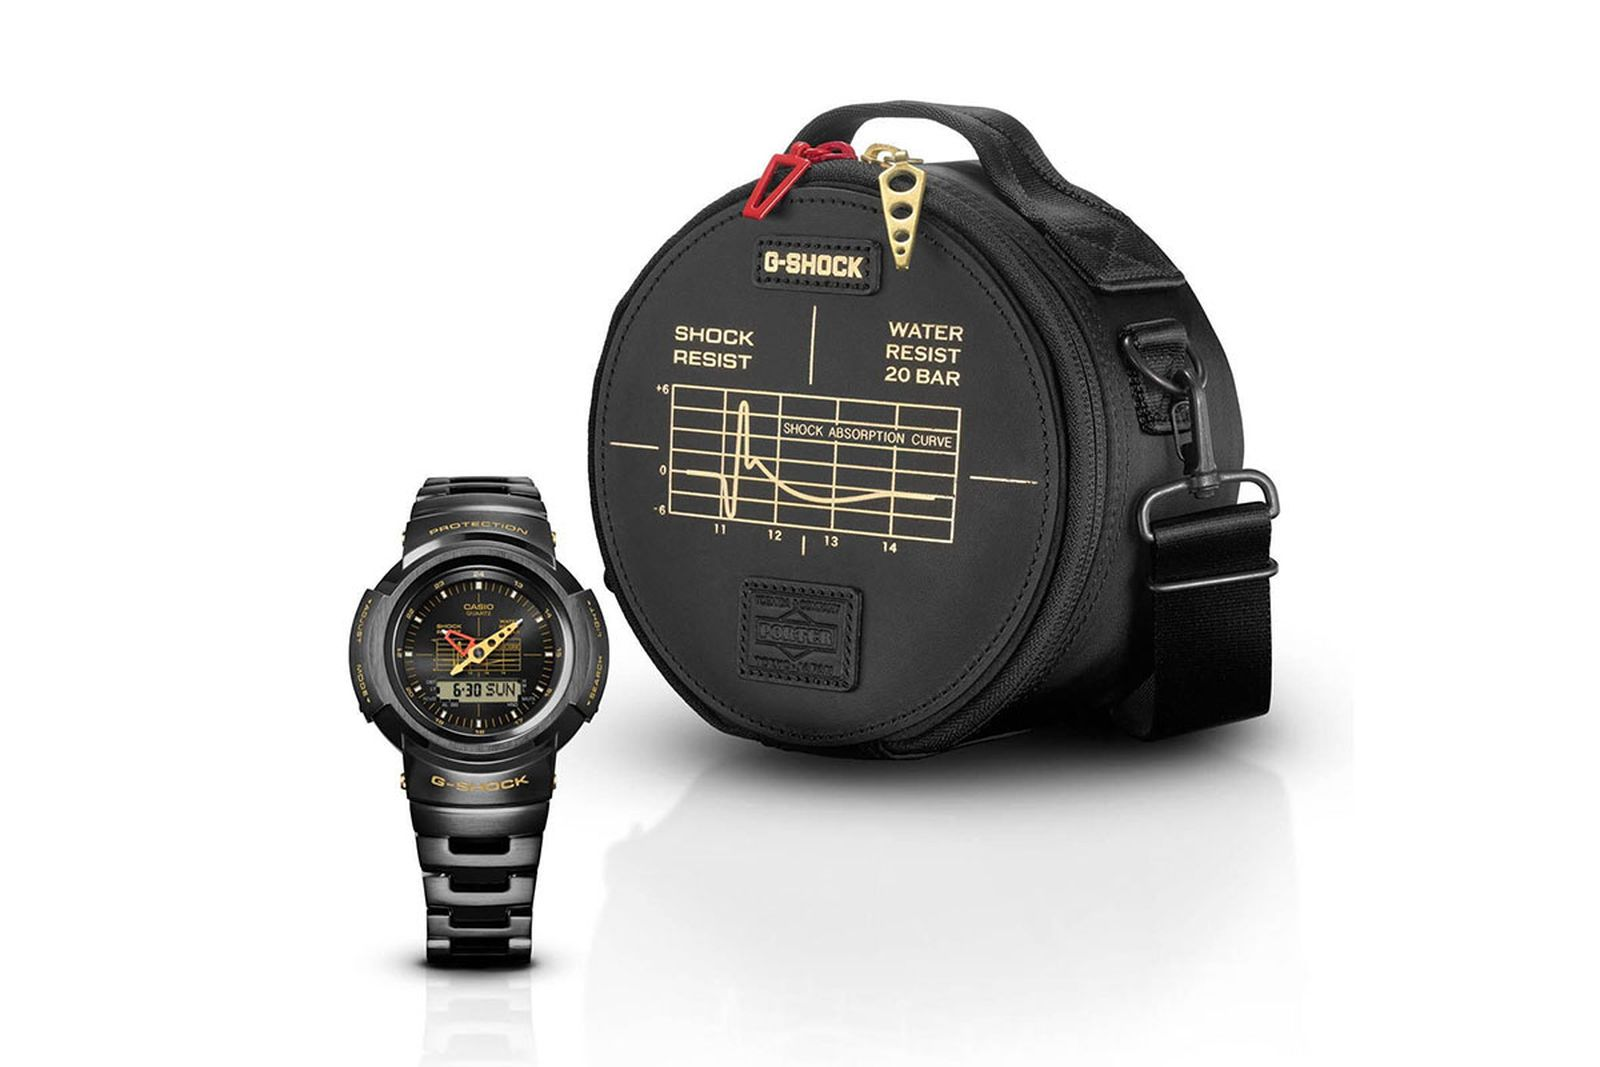 porter-g-shock-awm-50005